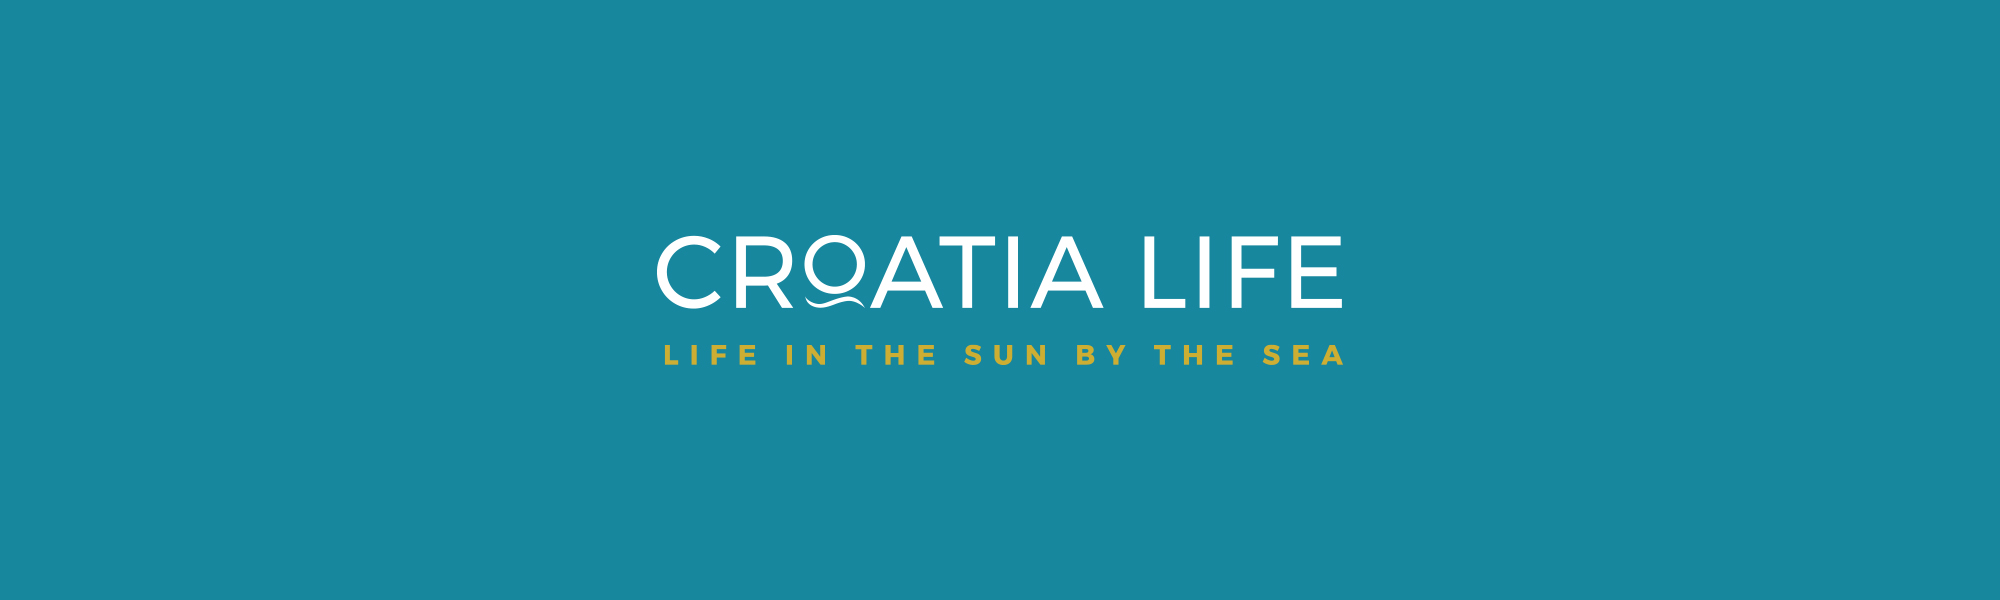 Croatia Life branding